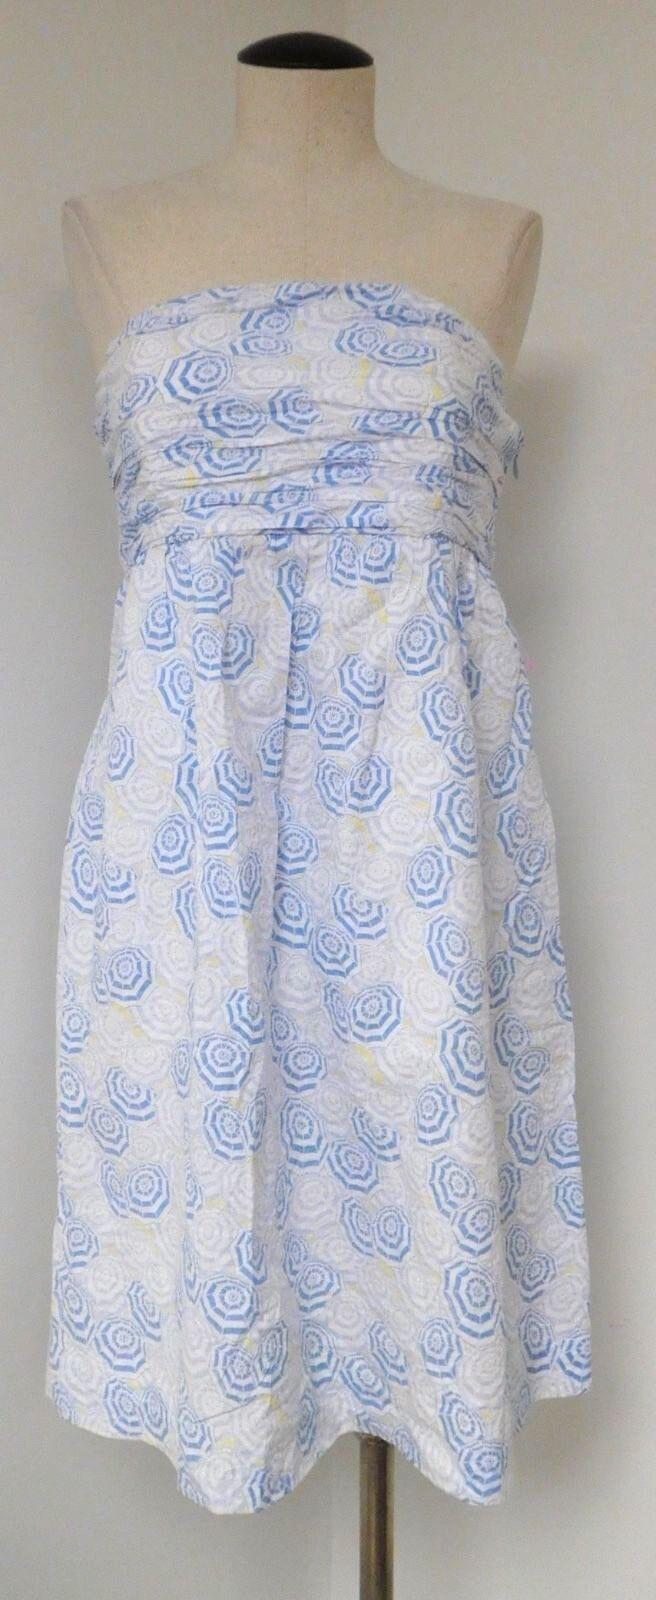 VINEYARD VINES 100% COTTON WHITE & blueE BEACH UMBRELLA STRAPLESS DRESS KNEE LENG